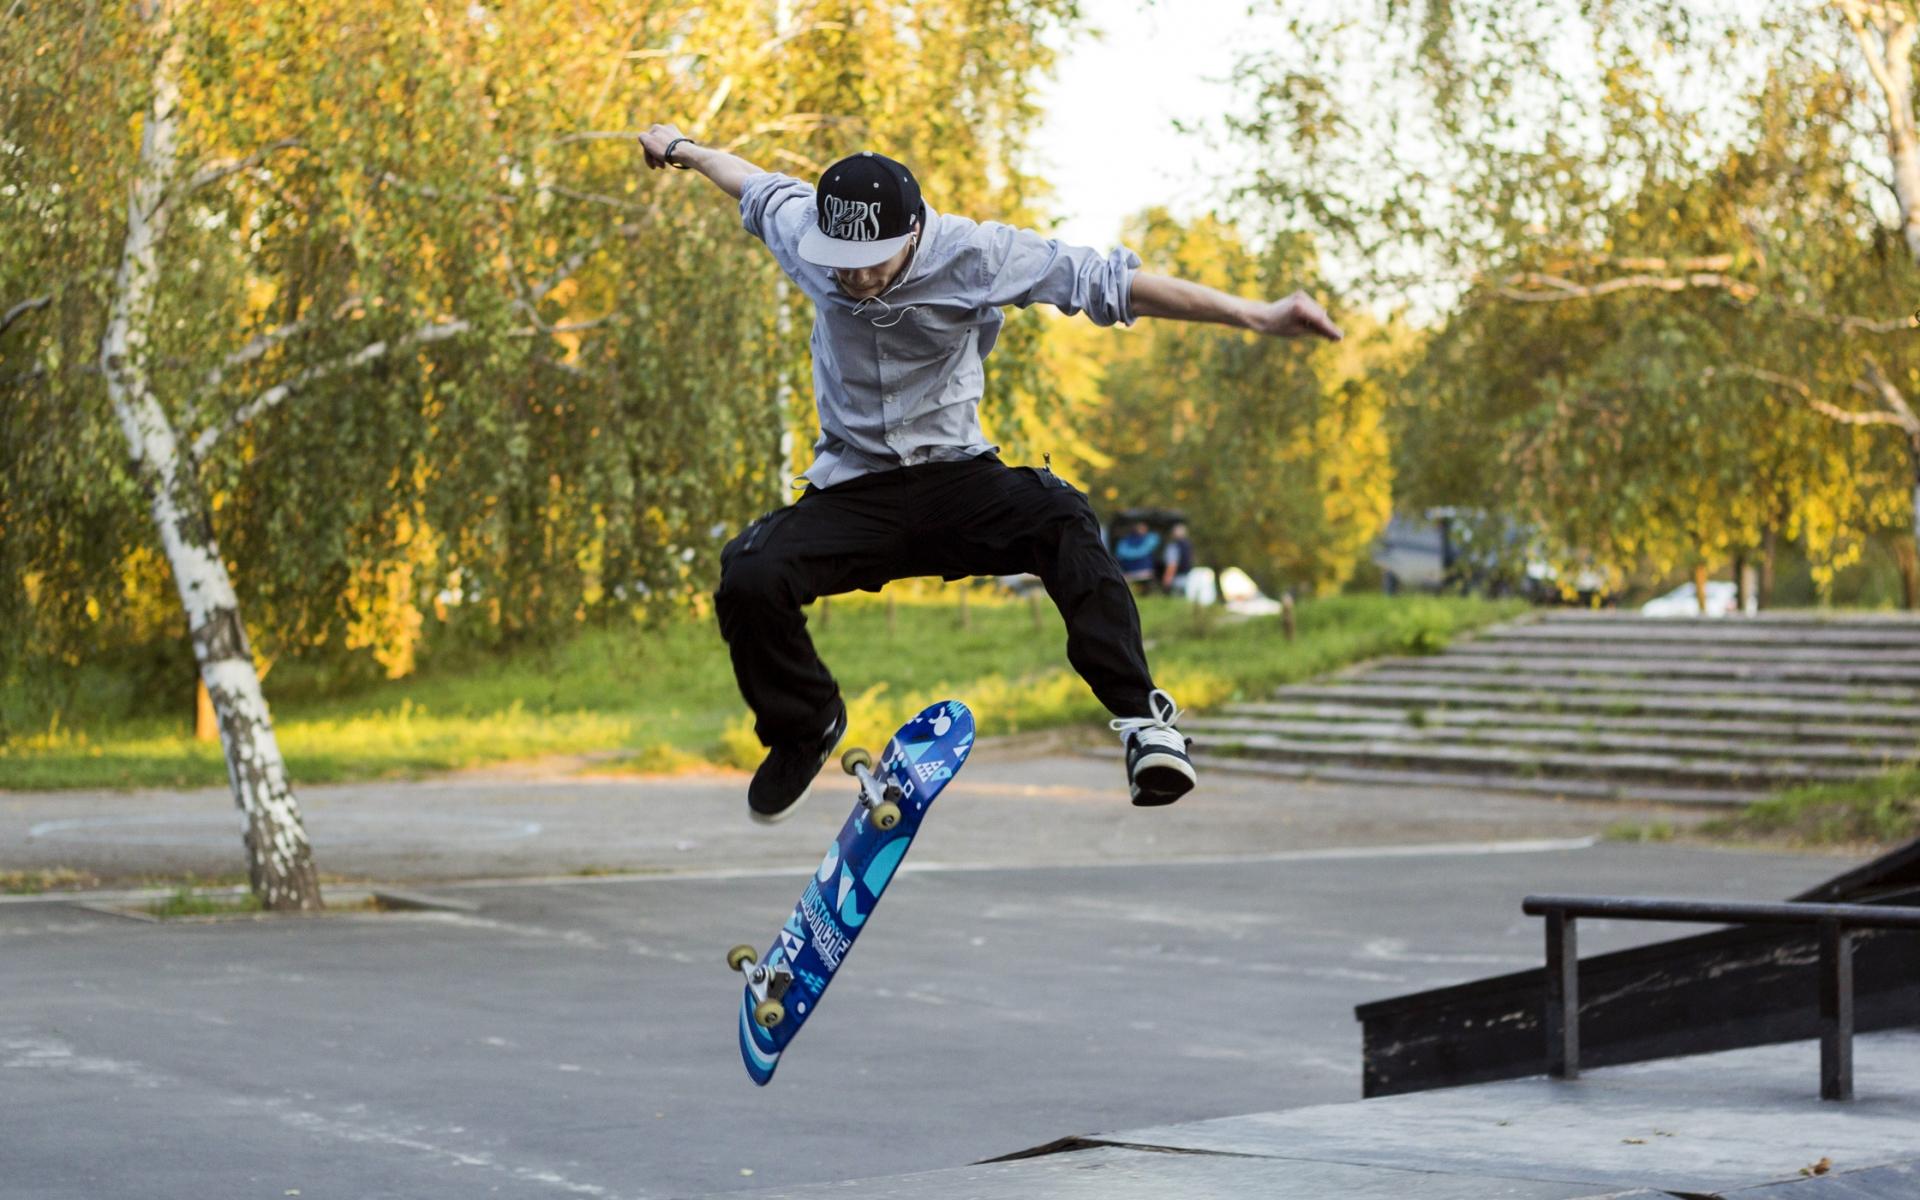 Trucos con skate - 1920x1200